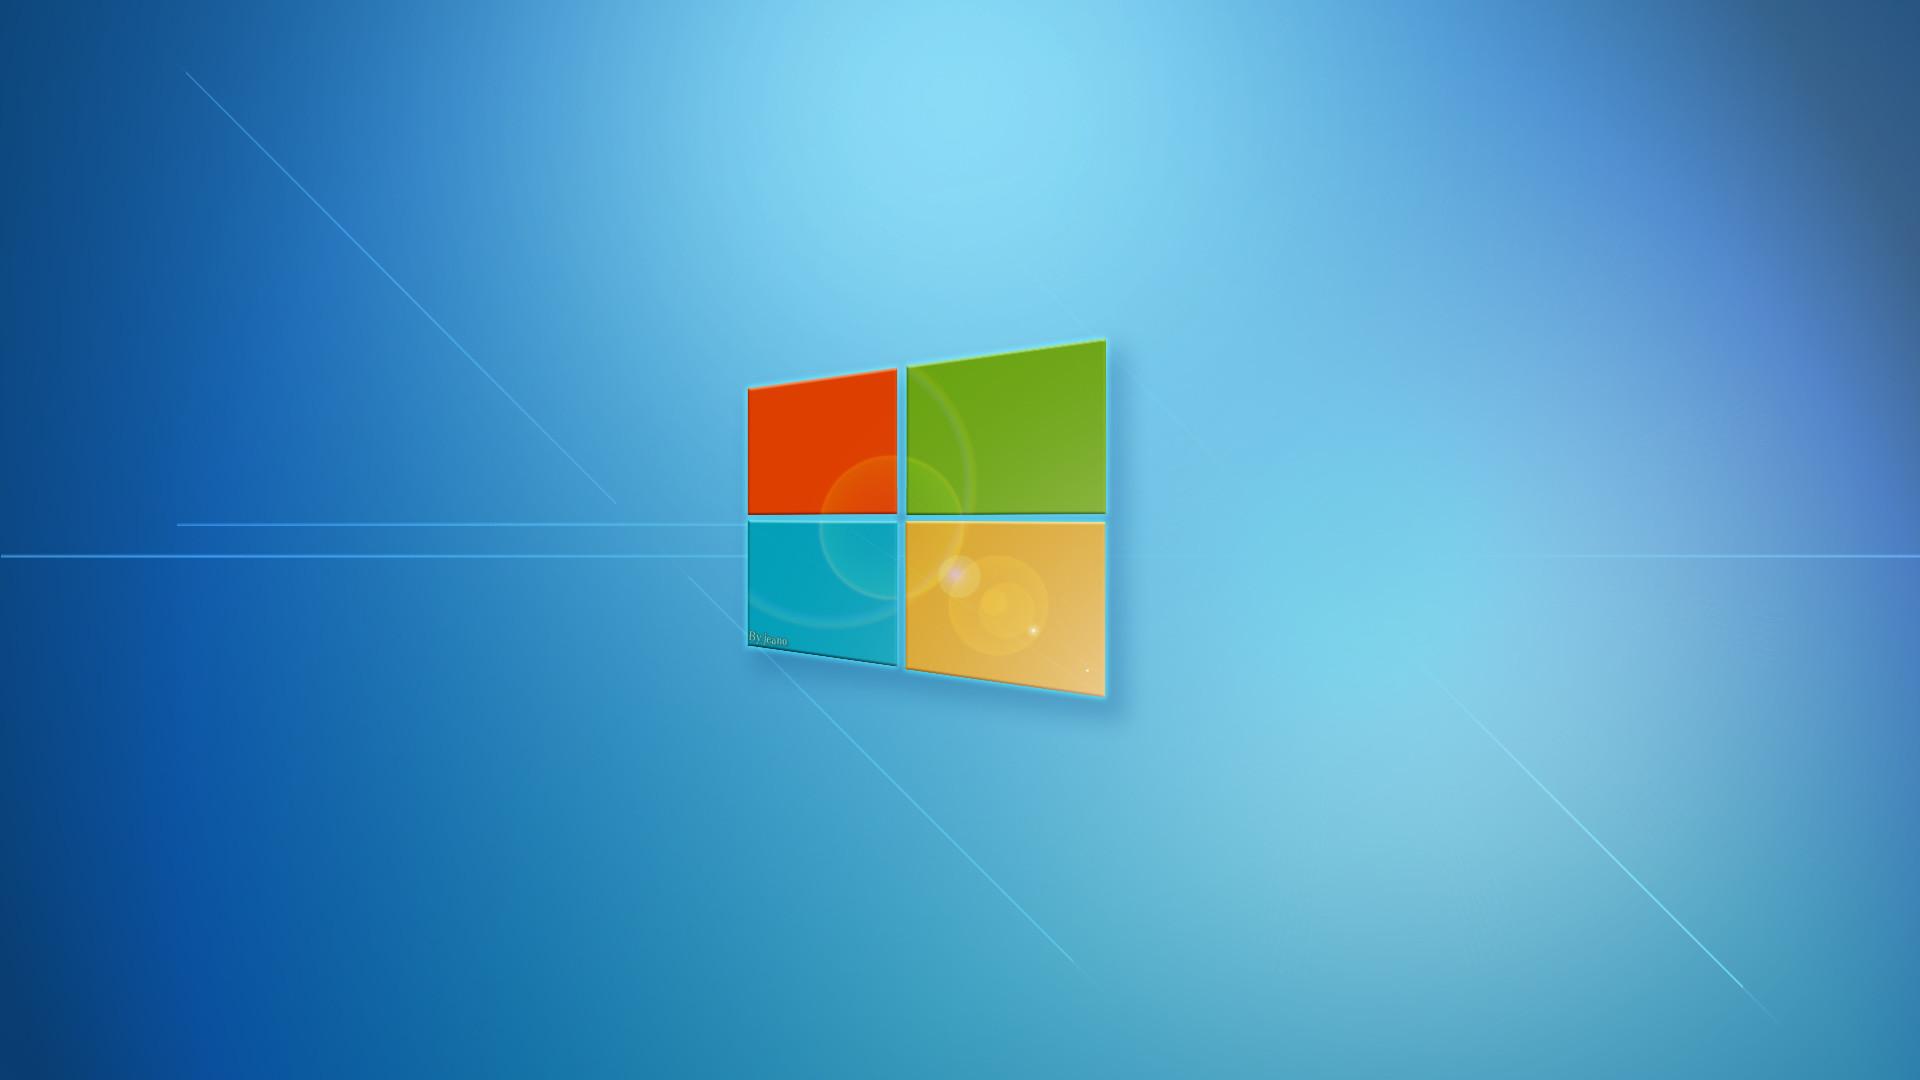 Windows 10 hd desktop wallpaper 74 images - Hd wallpapers for pc windows ...